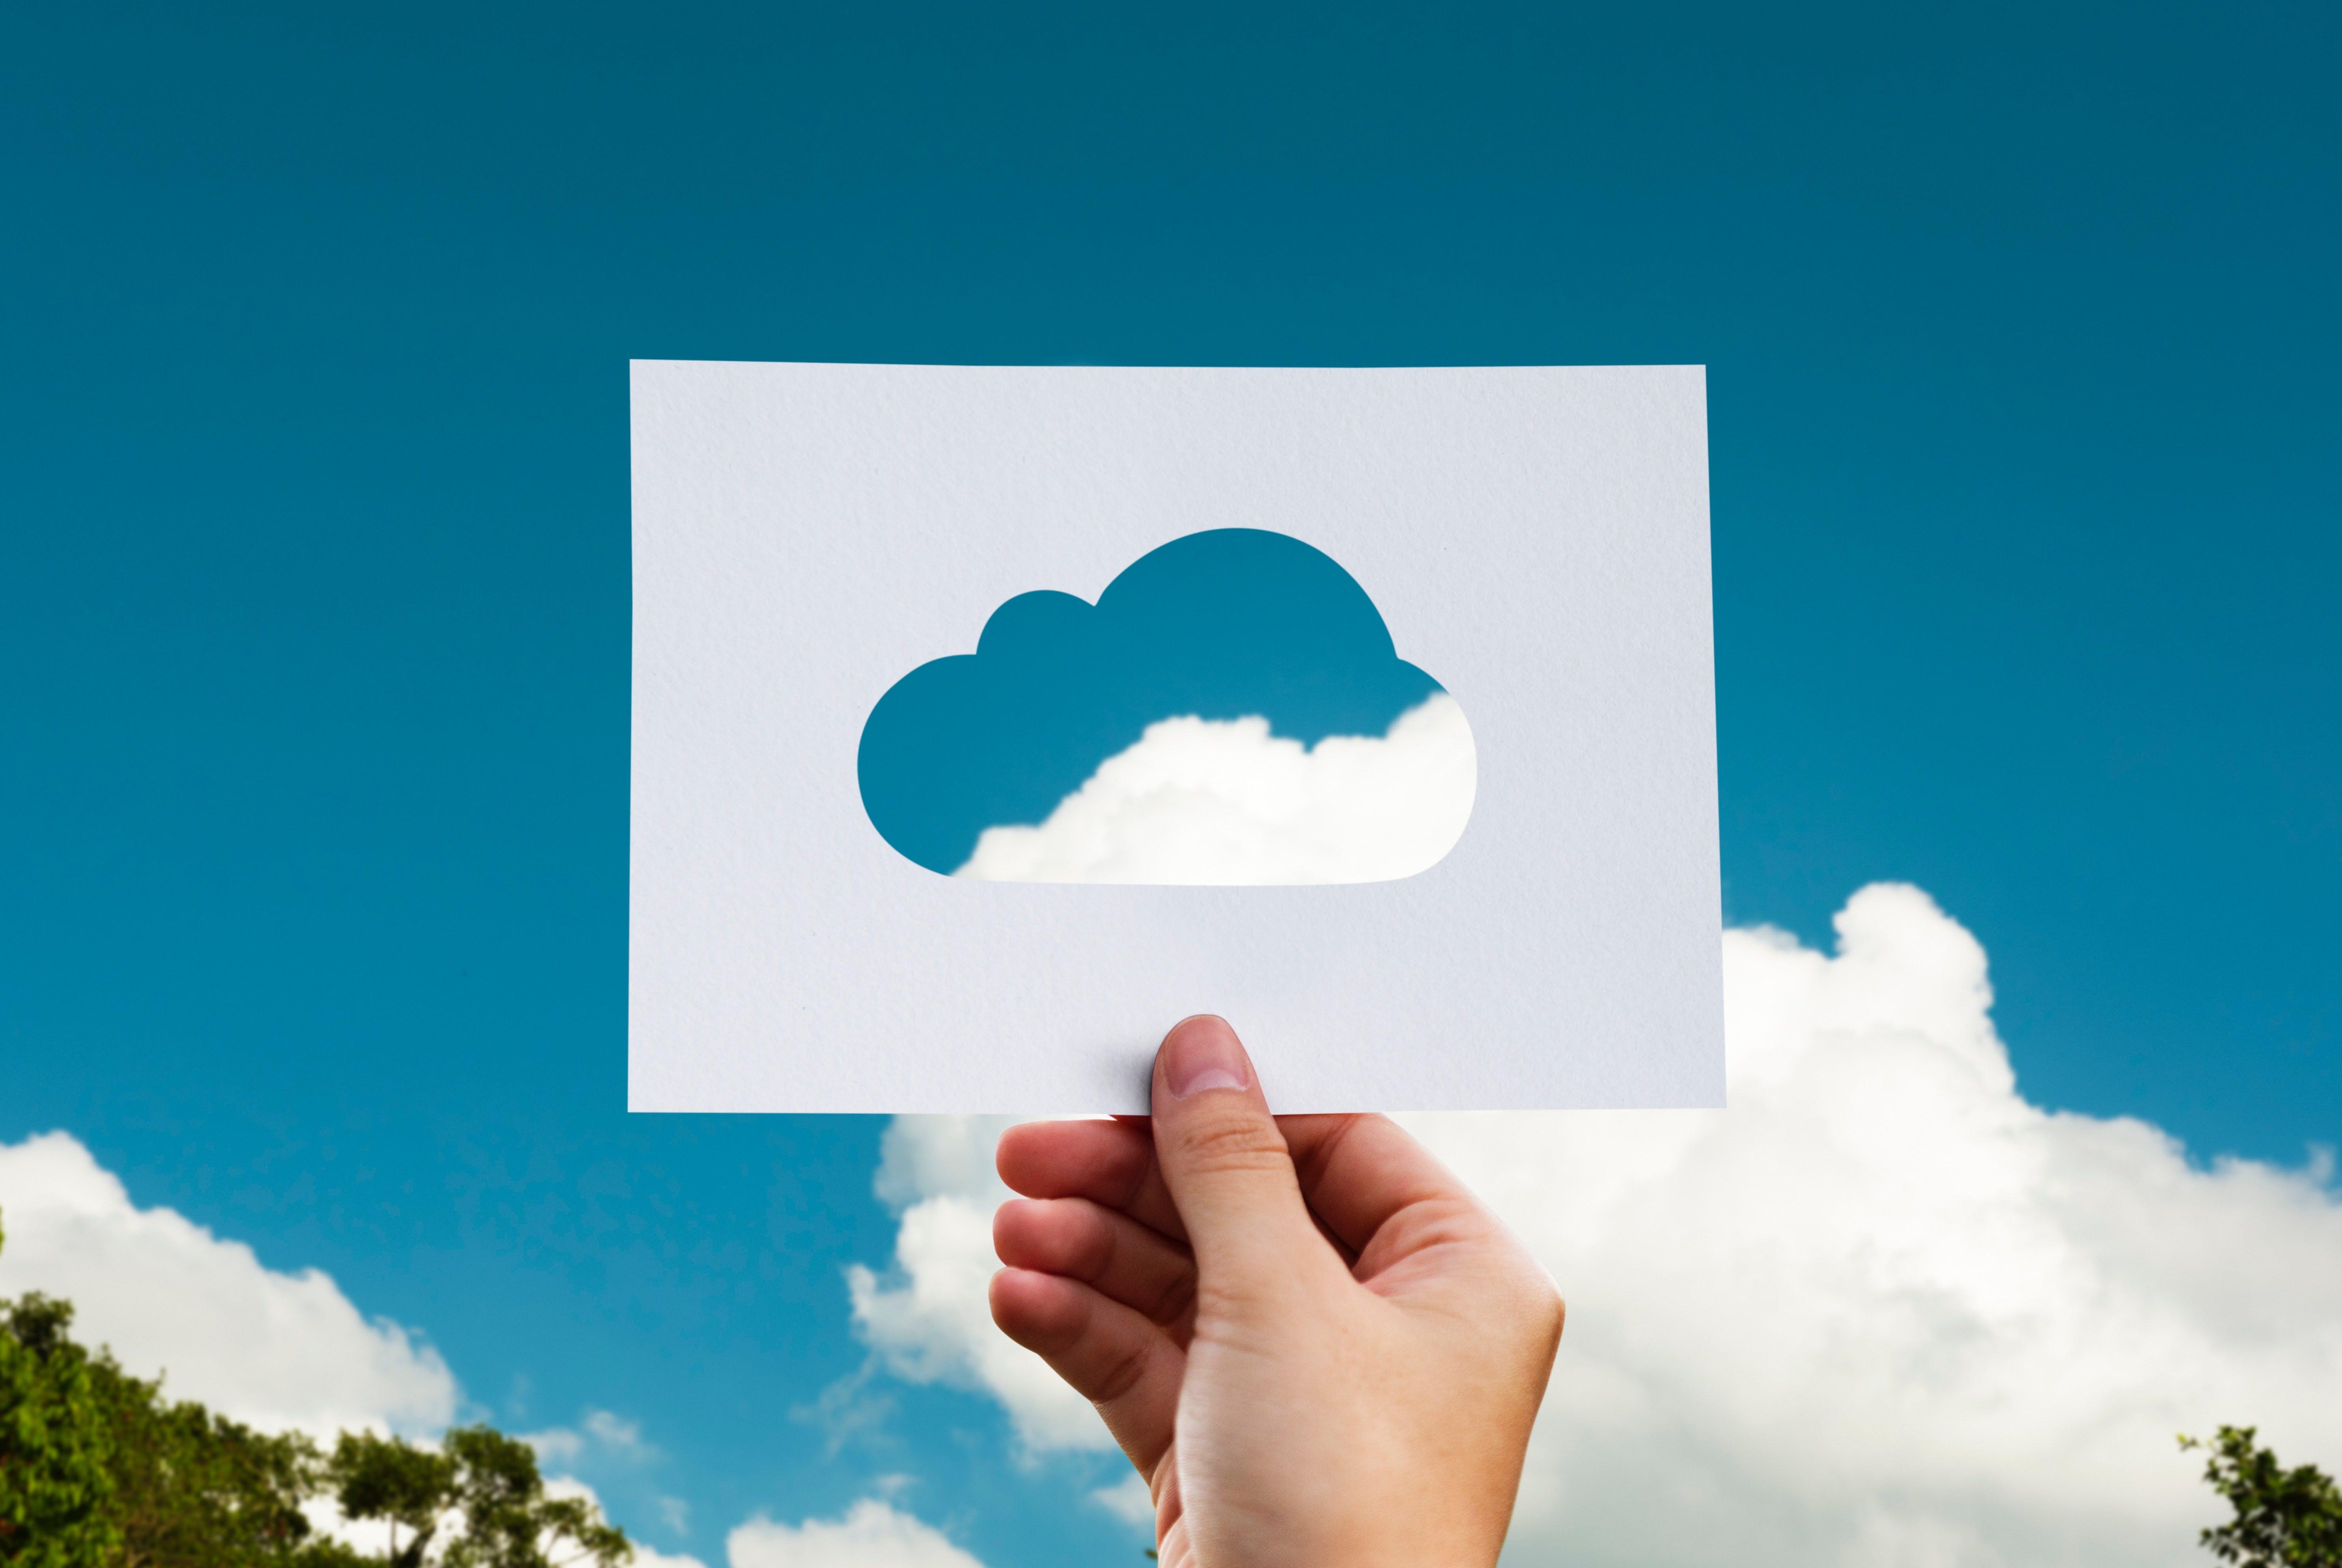 Cloud-Wolken-Schablone-Kunst-Blauer-Himmel-335907-pexels